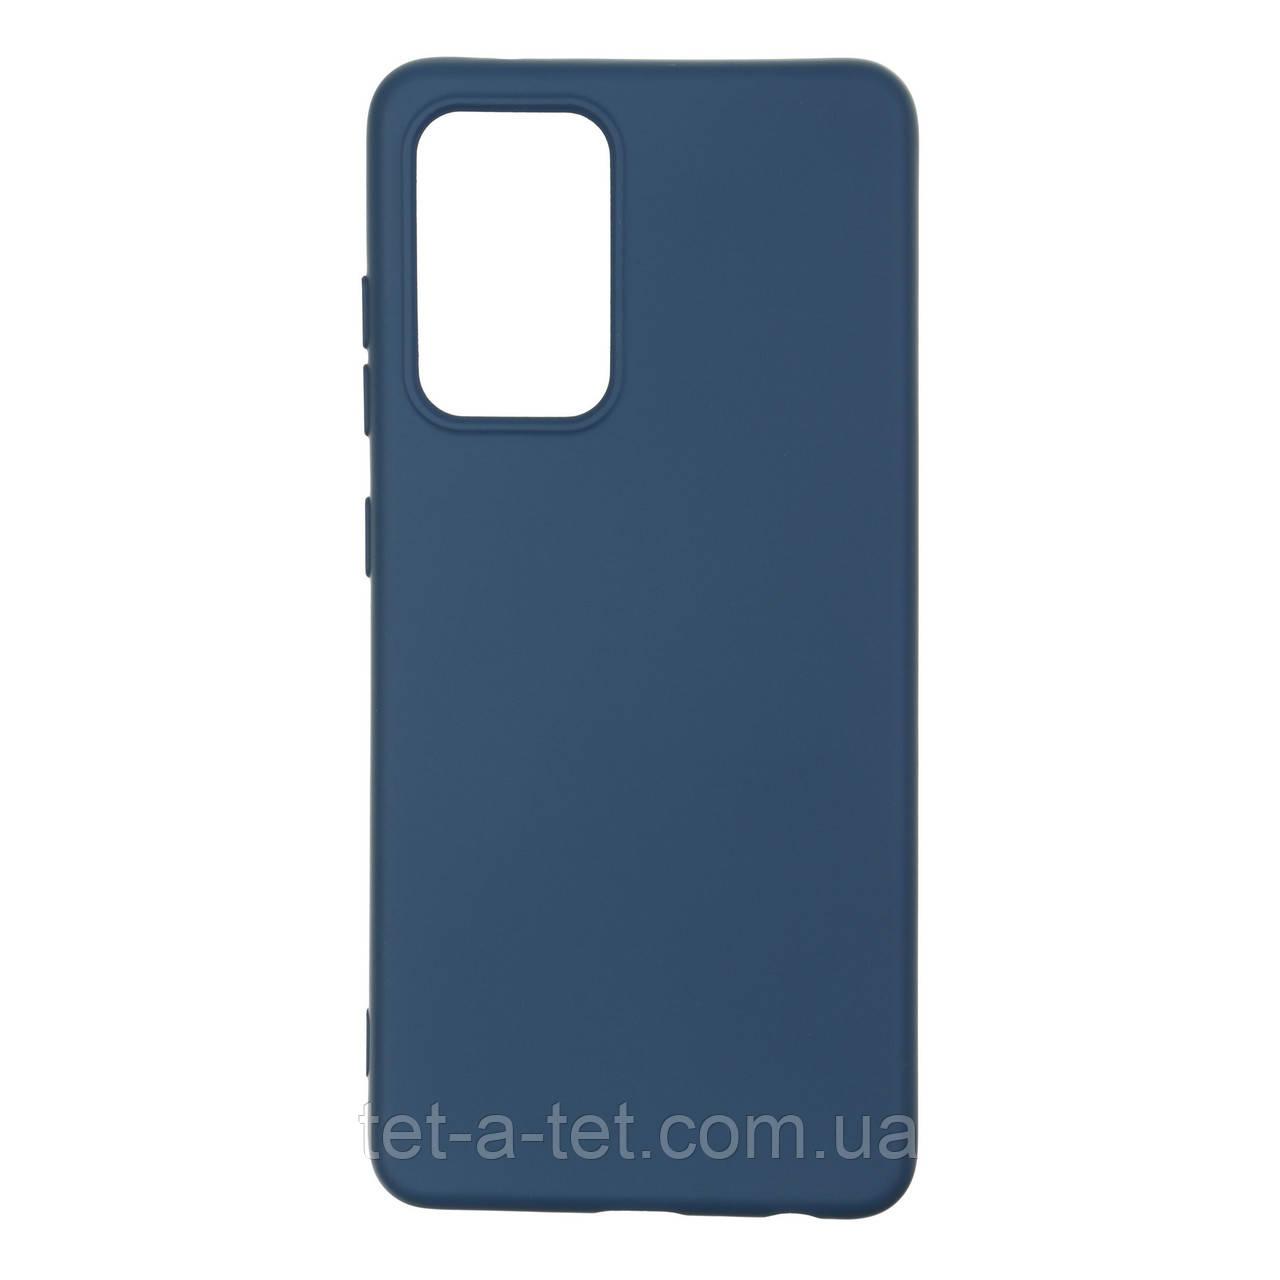 Чохол силіконовий ArmorStandart ICON Case for Samsung A52 (A525) Dark Blue